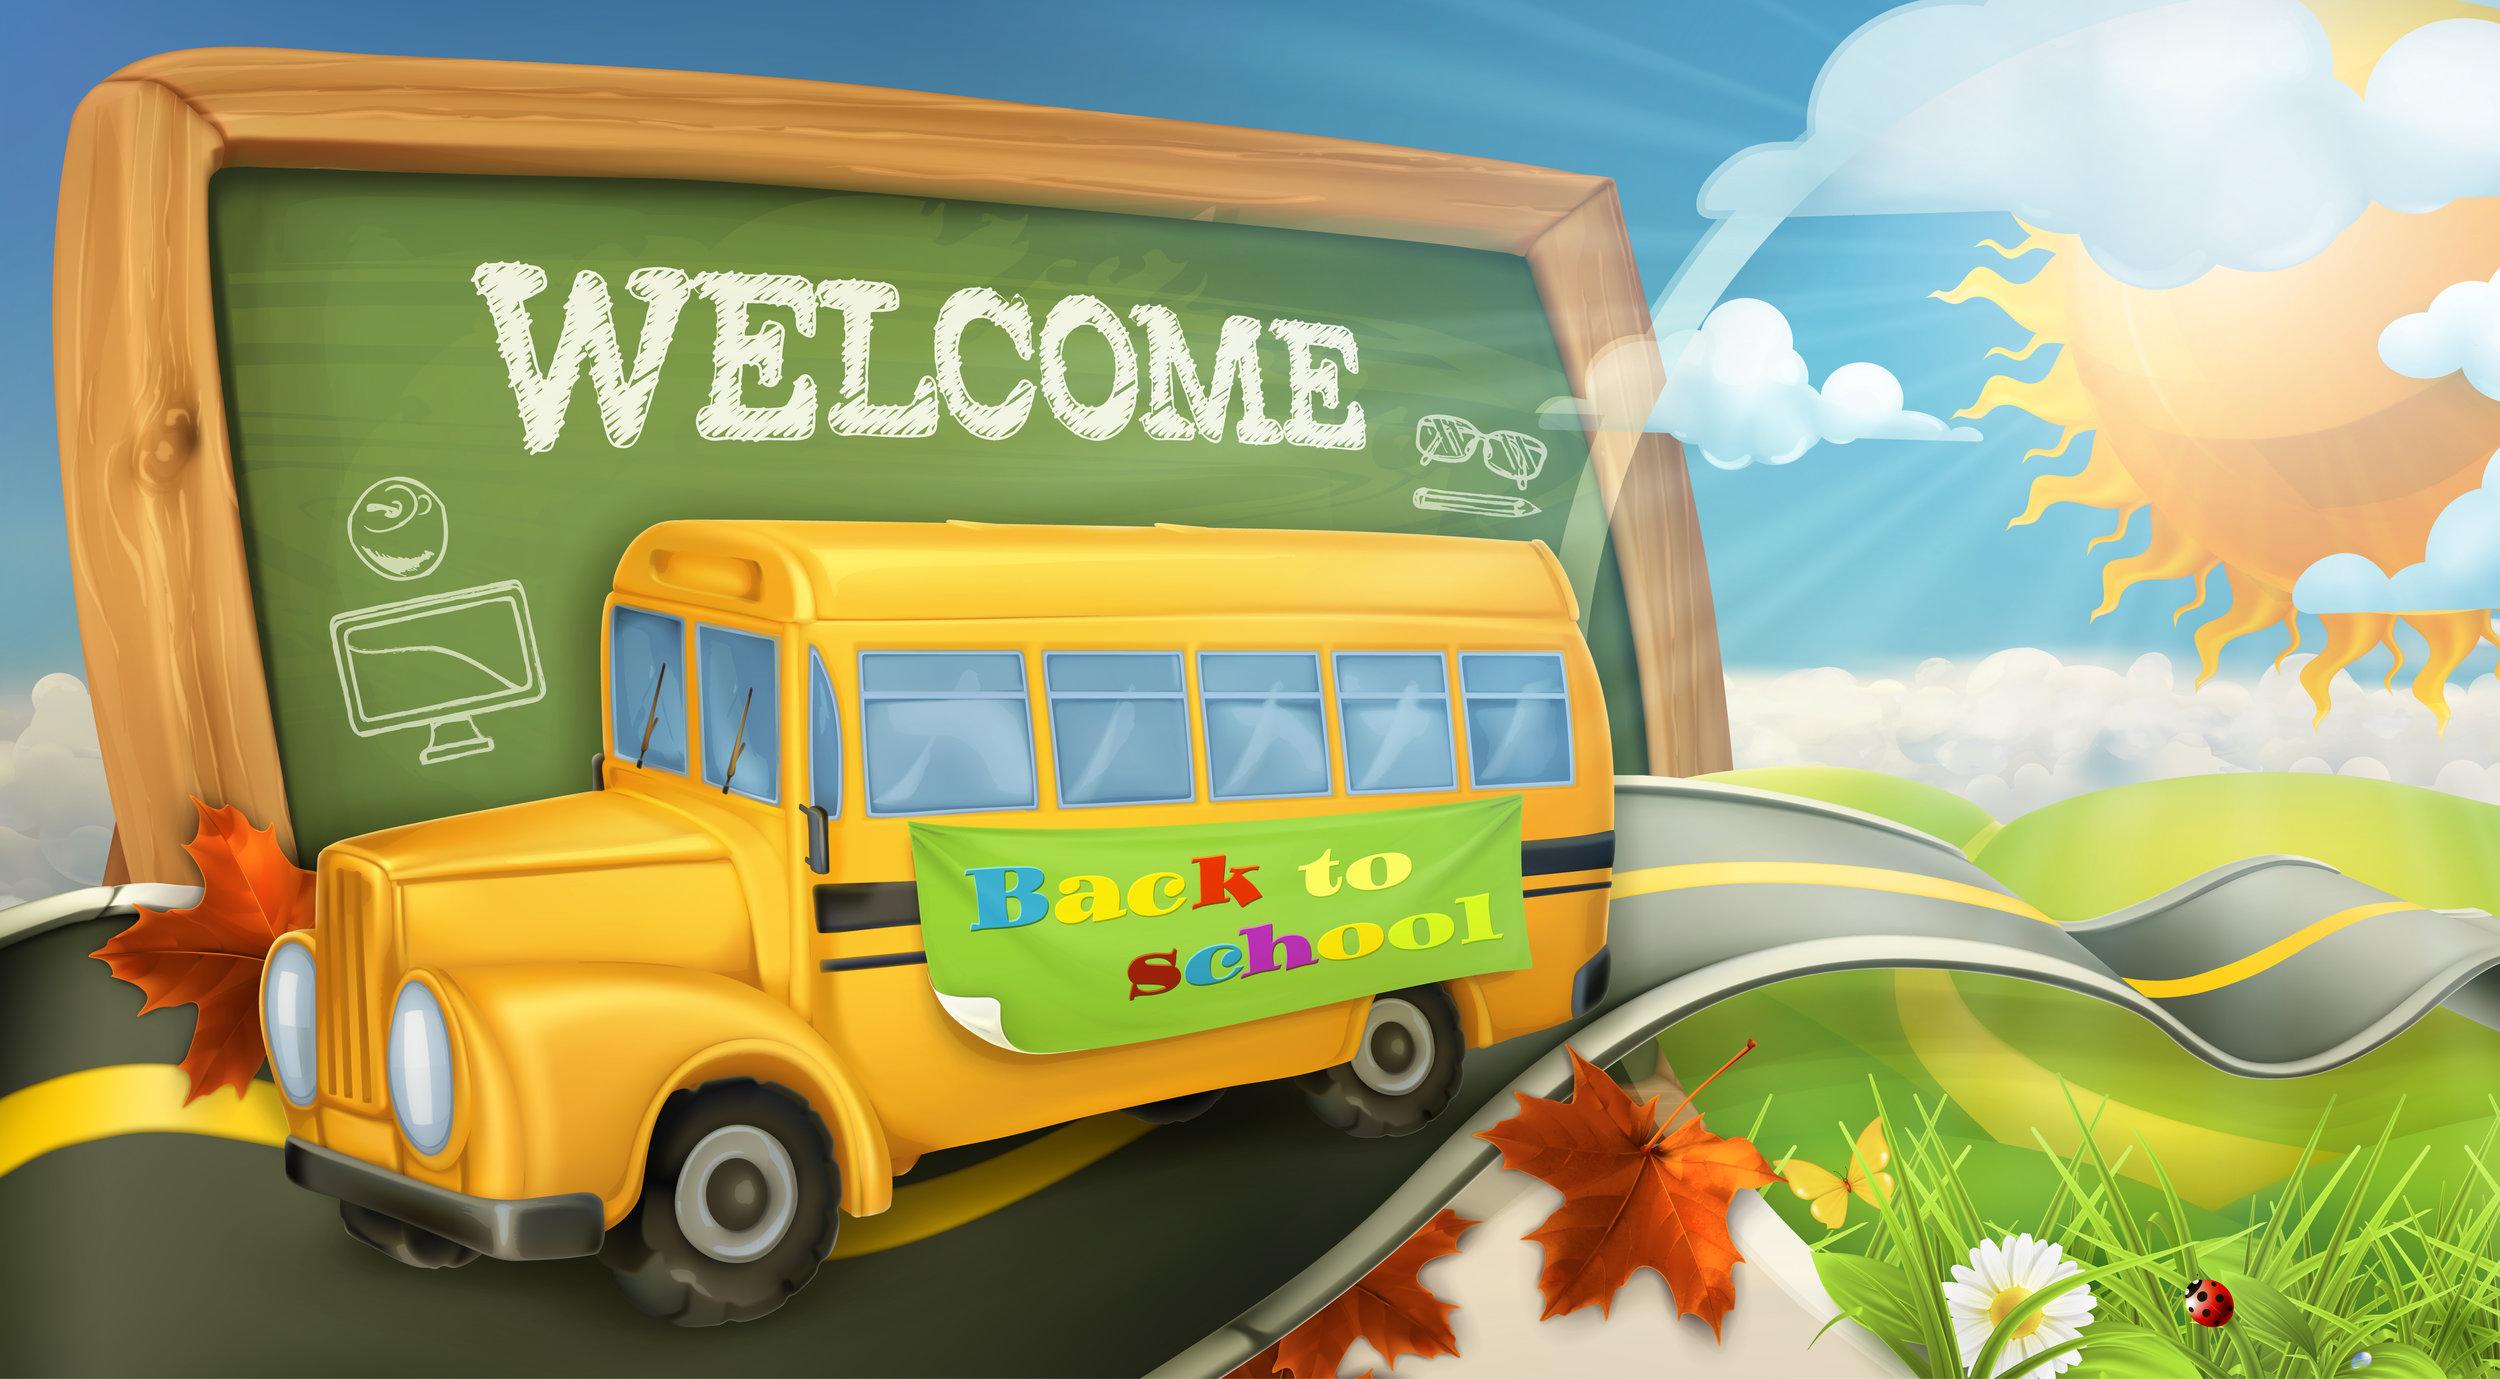 BackToSchool_IllustratedScene.jpg